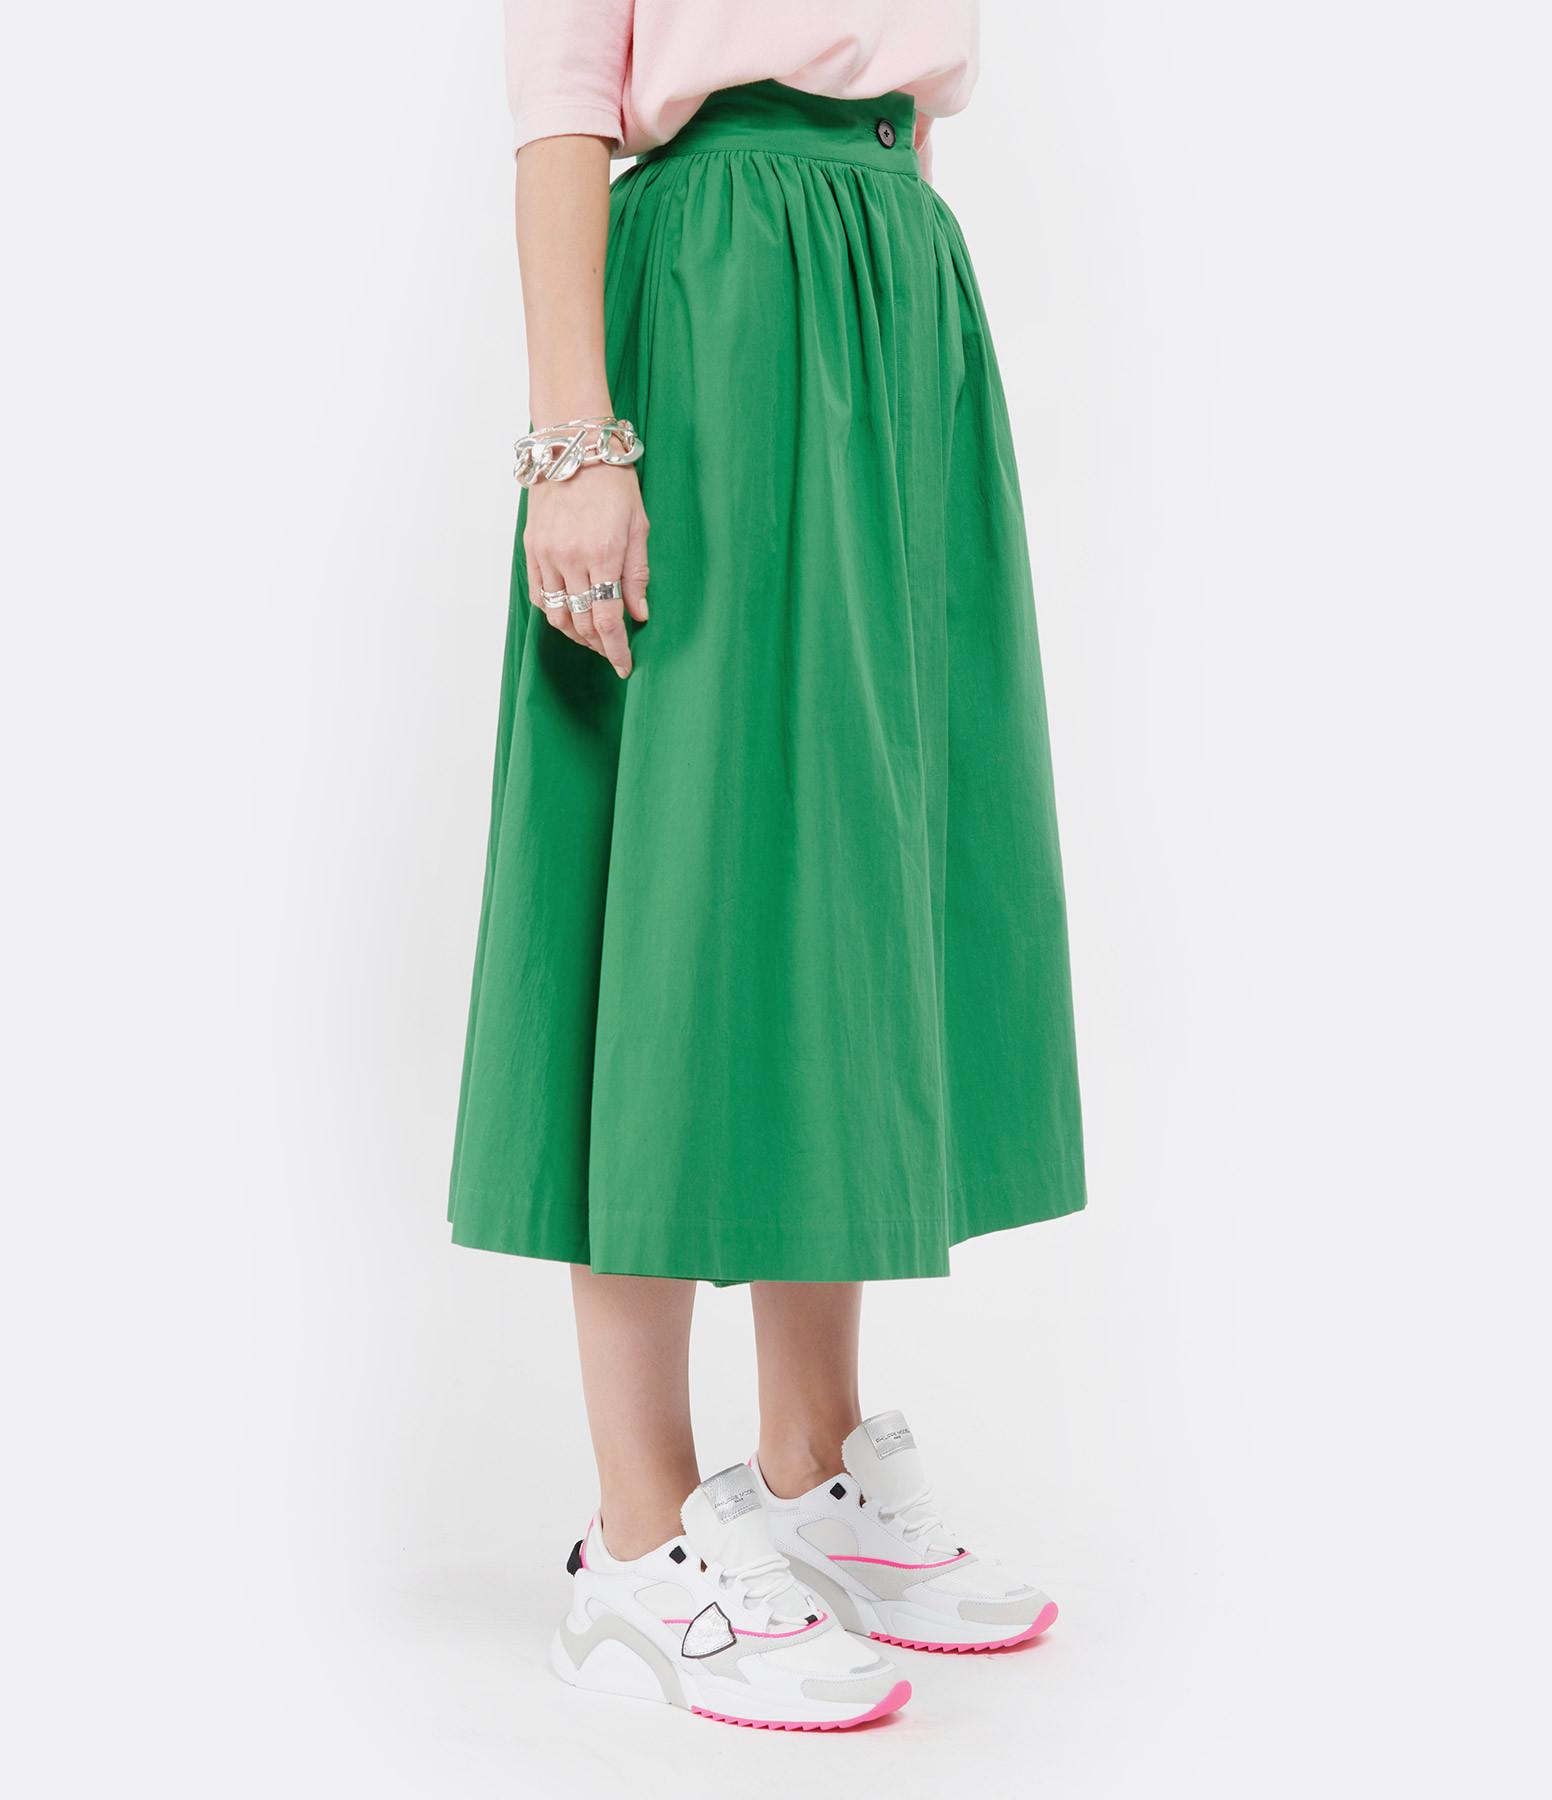 MII - Jupe Mona Coton Vert